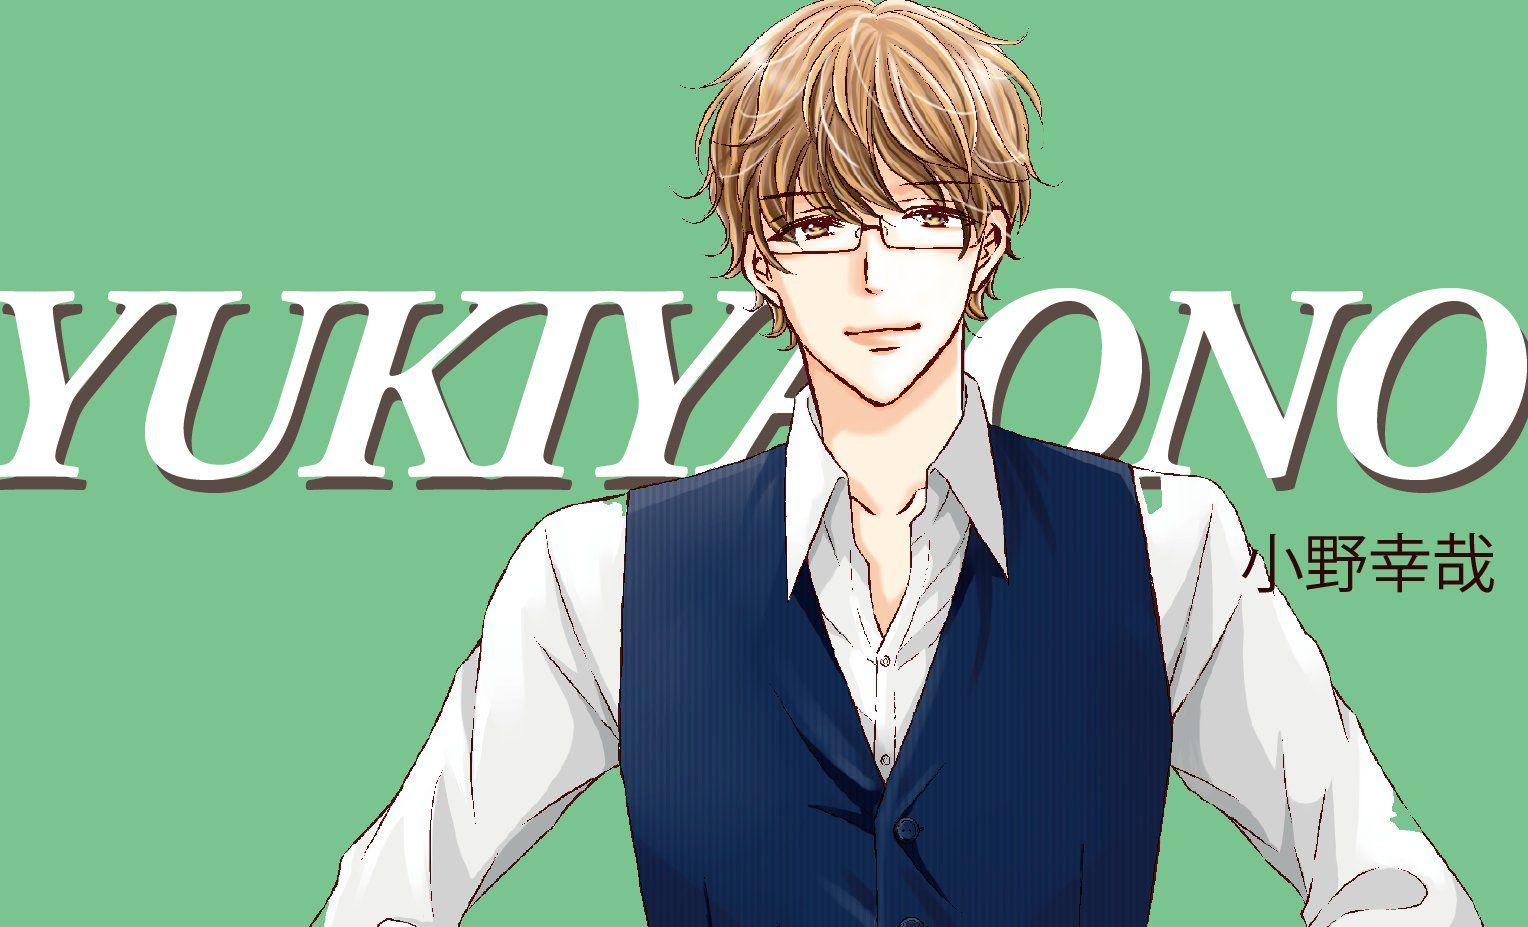 Yukiya_Ono-spin-off.jpg